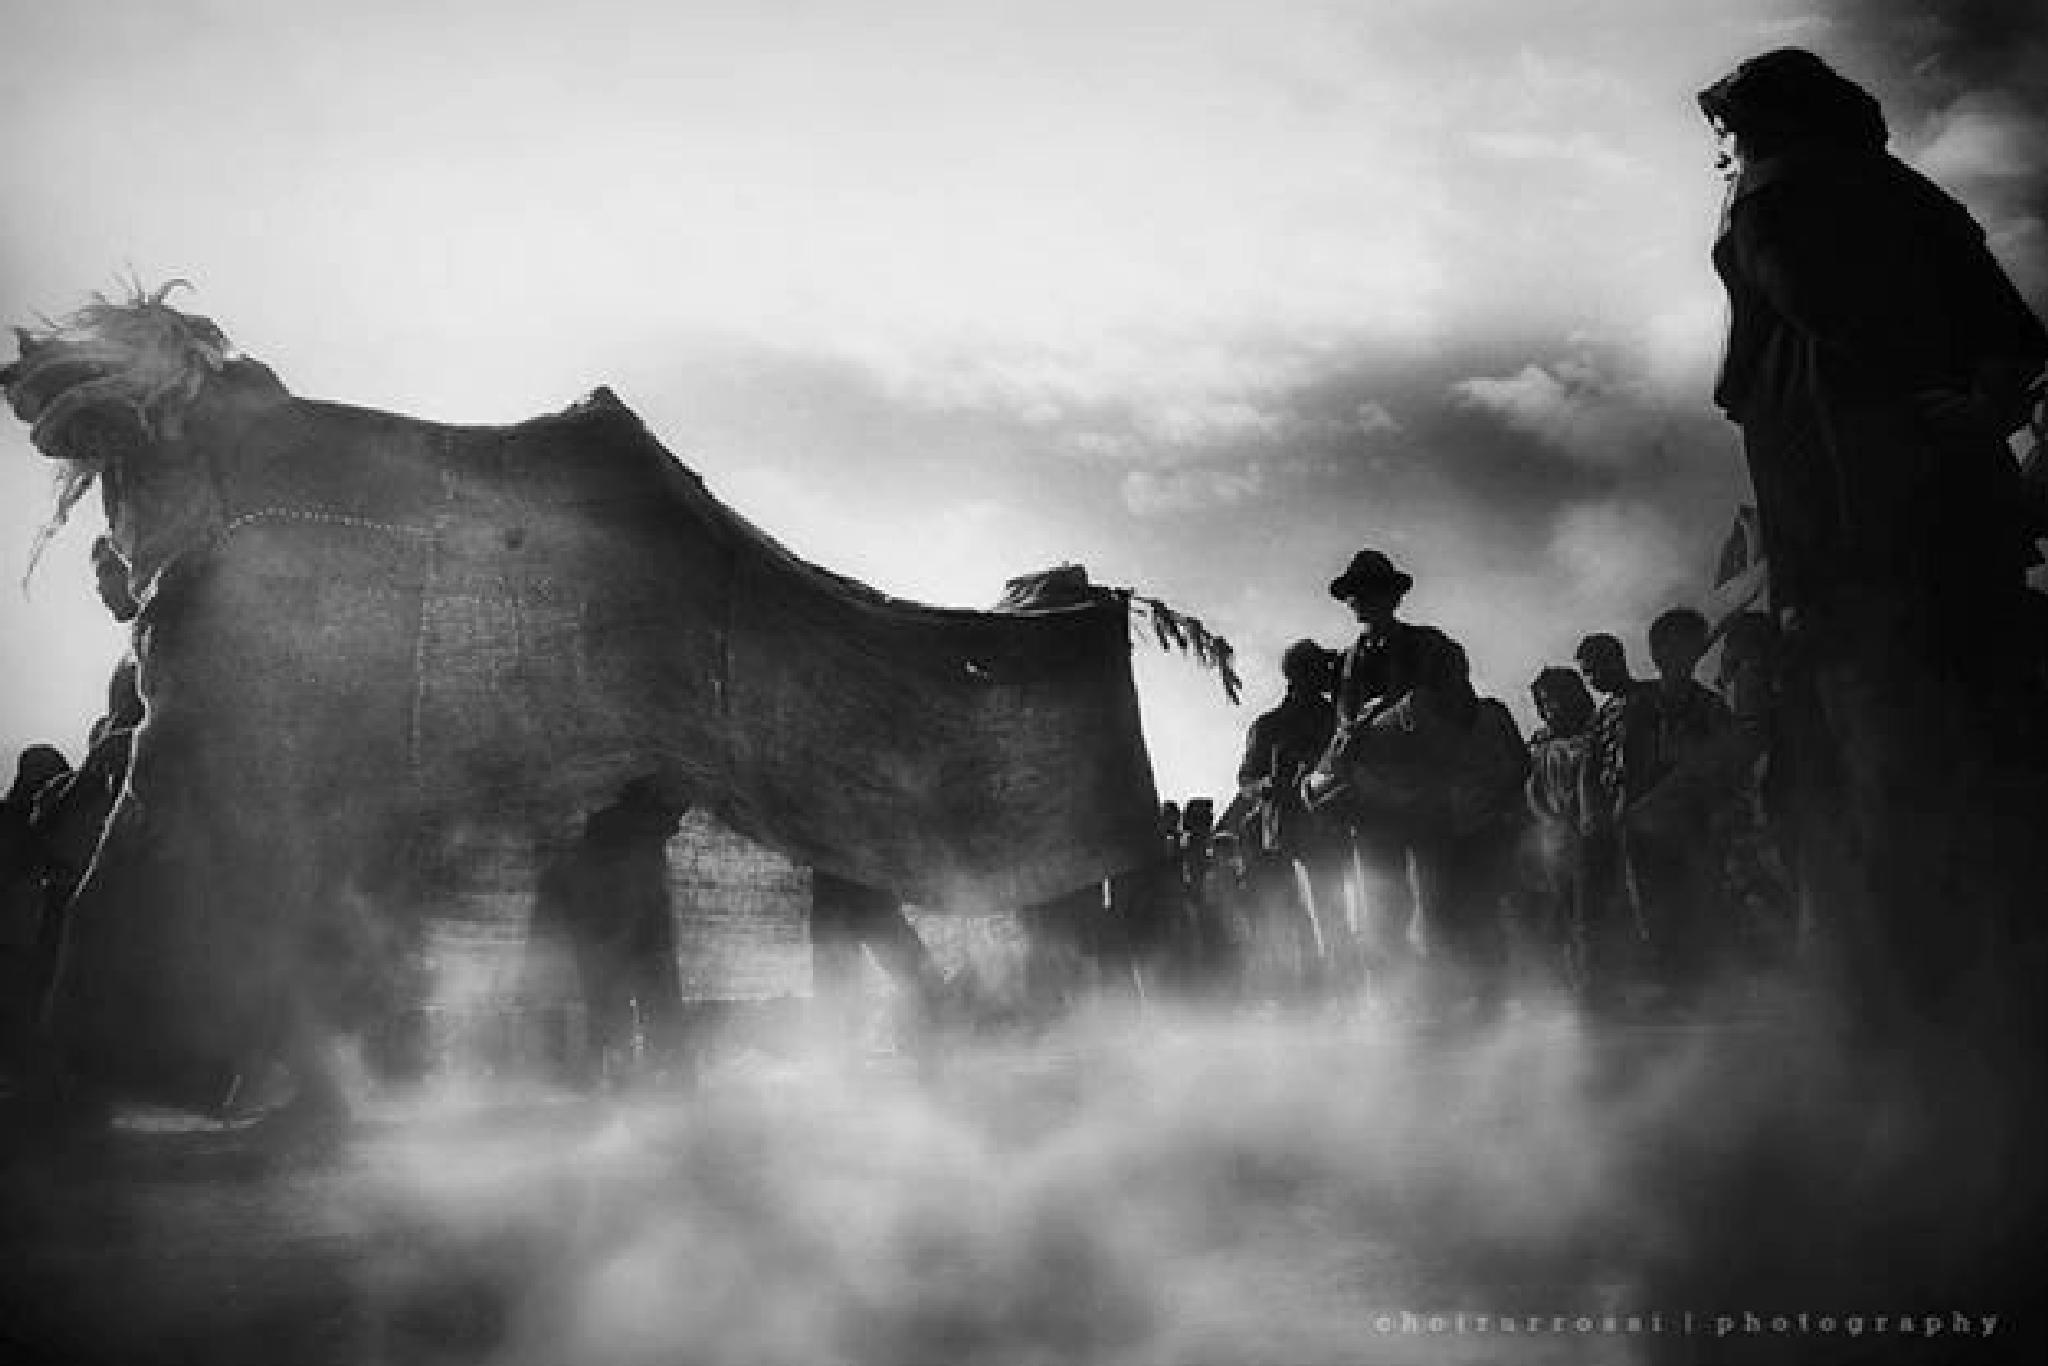 carnival by choirurrossie